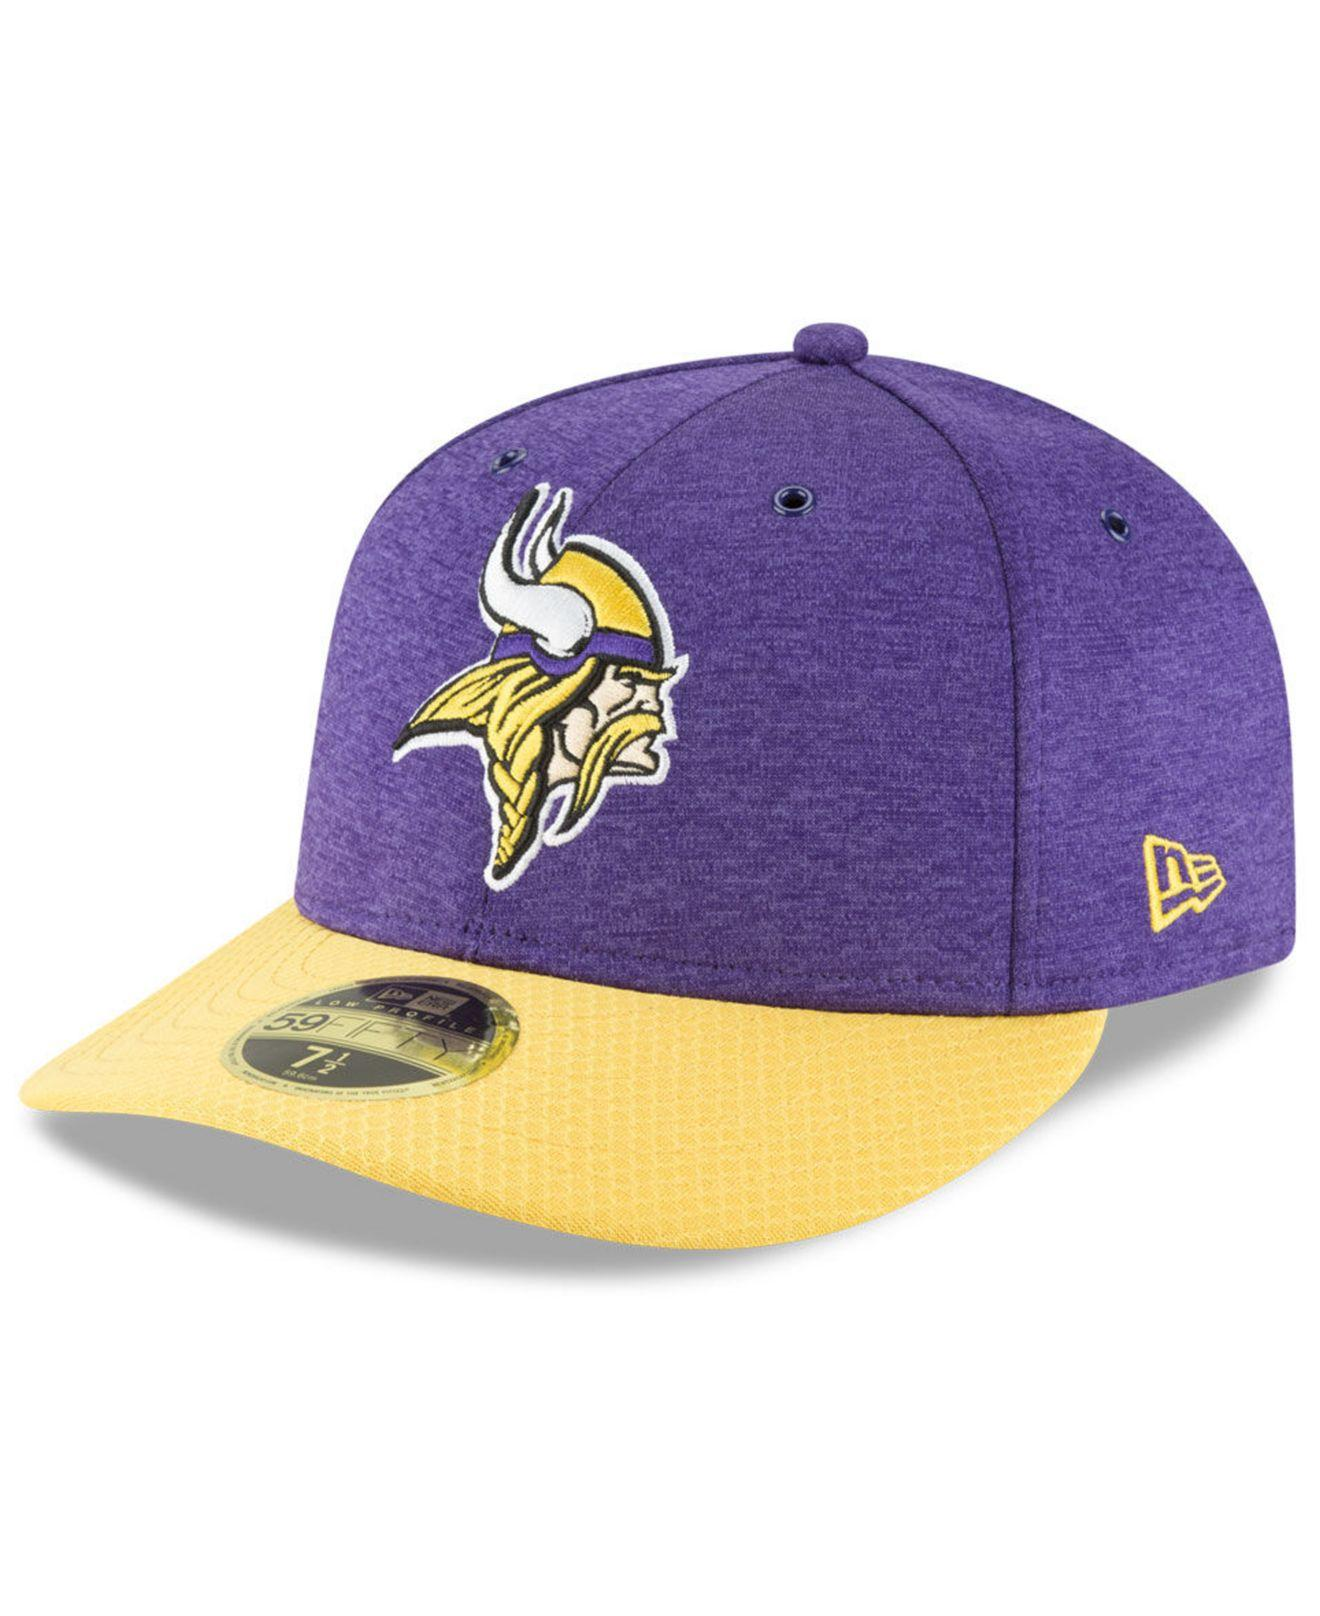 15c0b6df Lyst - Ktz Minnesota Vikings On Field Low Profile Sideline Home ...